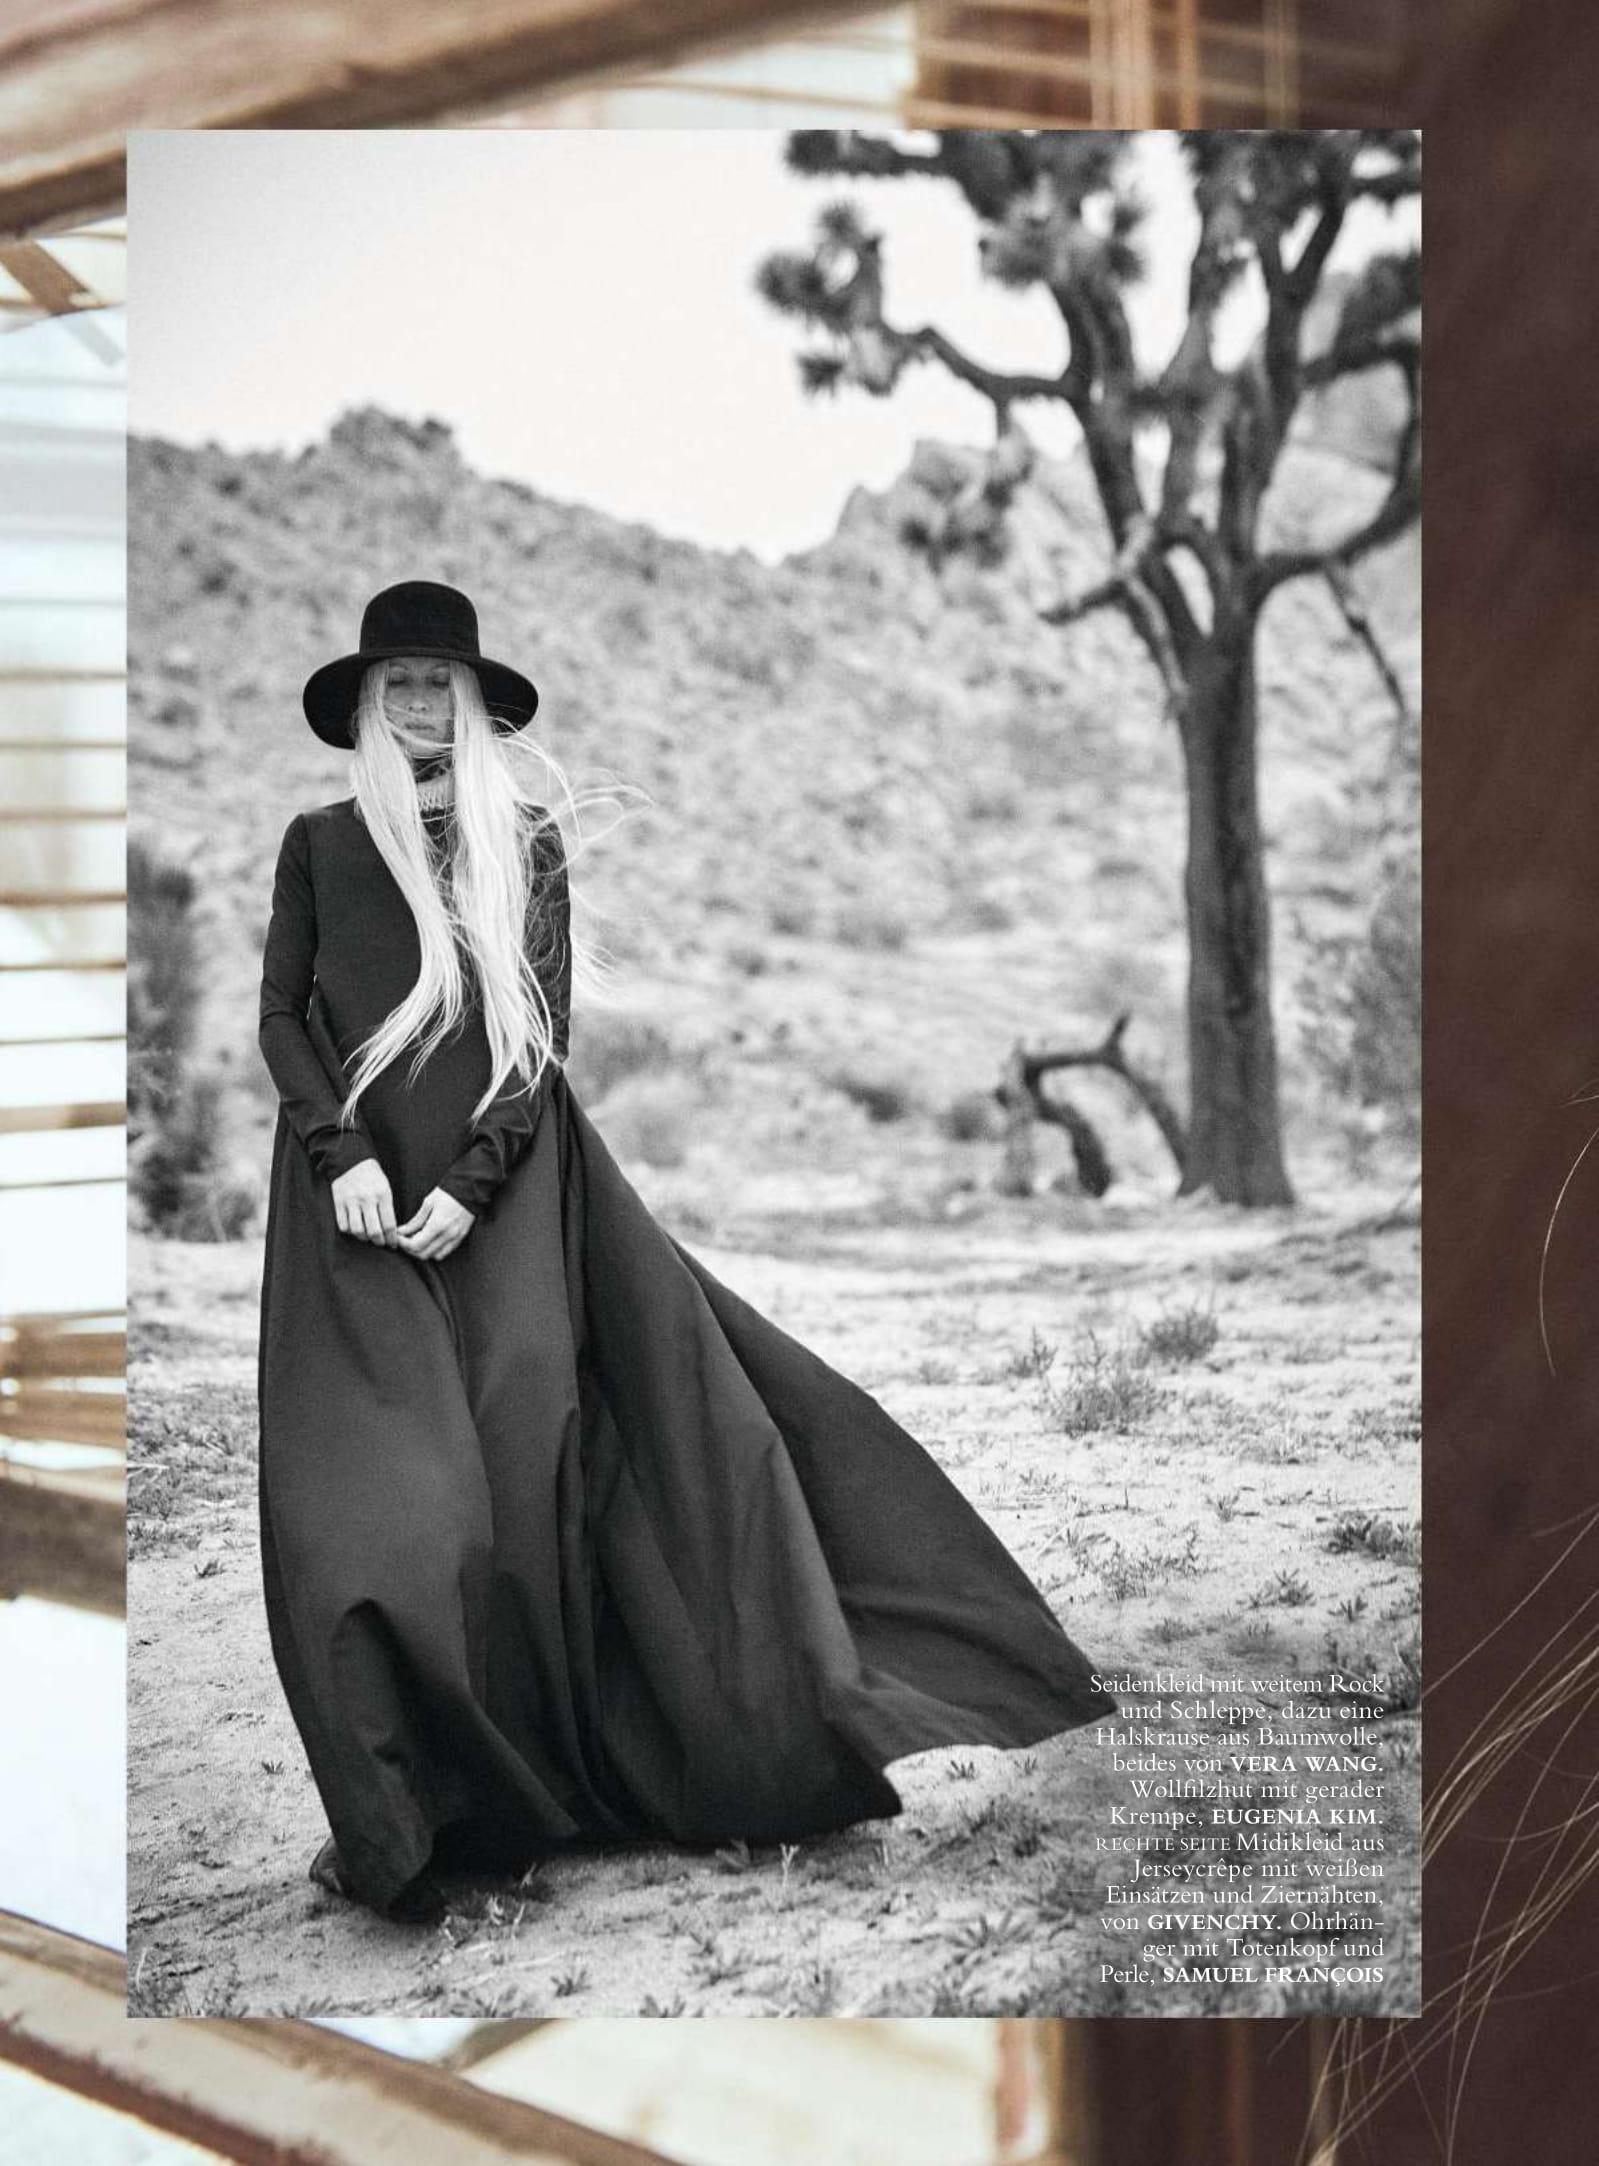 Kirsty-Hume-Regan-Cameron-Harpers-Bazaar-Germany-April-2019- (8).jpg